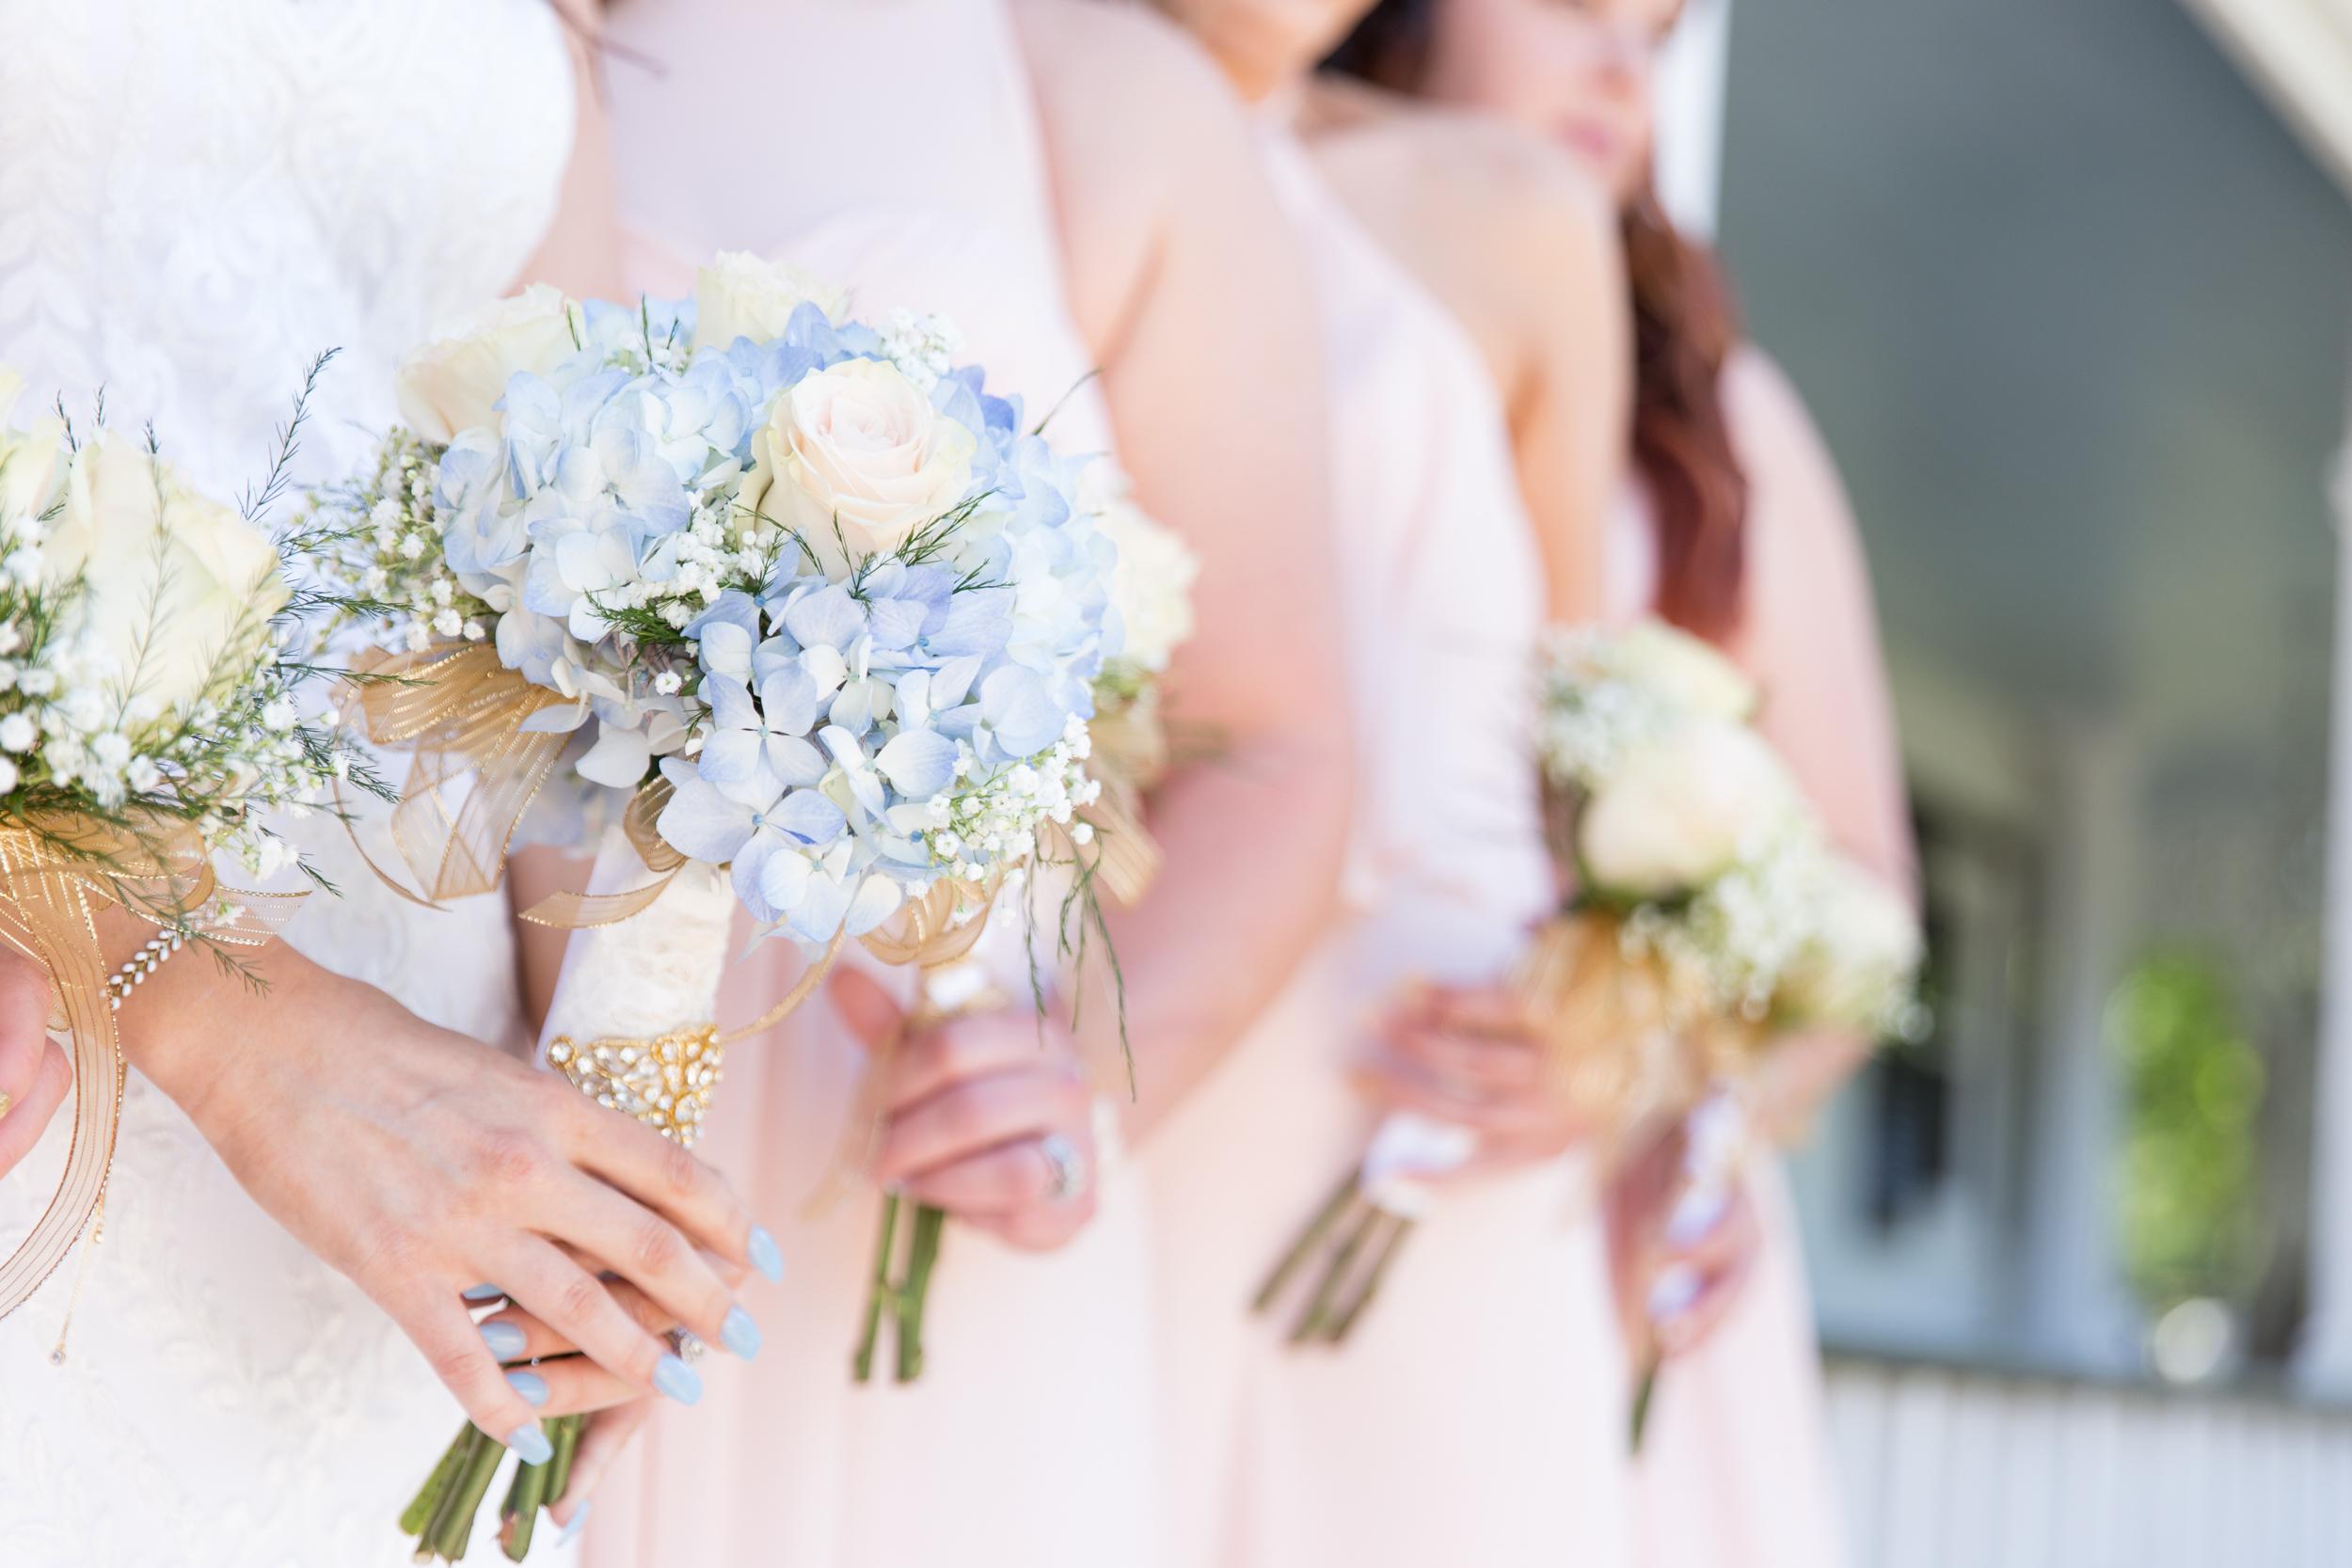 Zihlman-East TX Wedding_Kelsie Hendricks Photography_The Folmar Tyler Texas-17.jpg